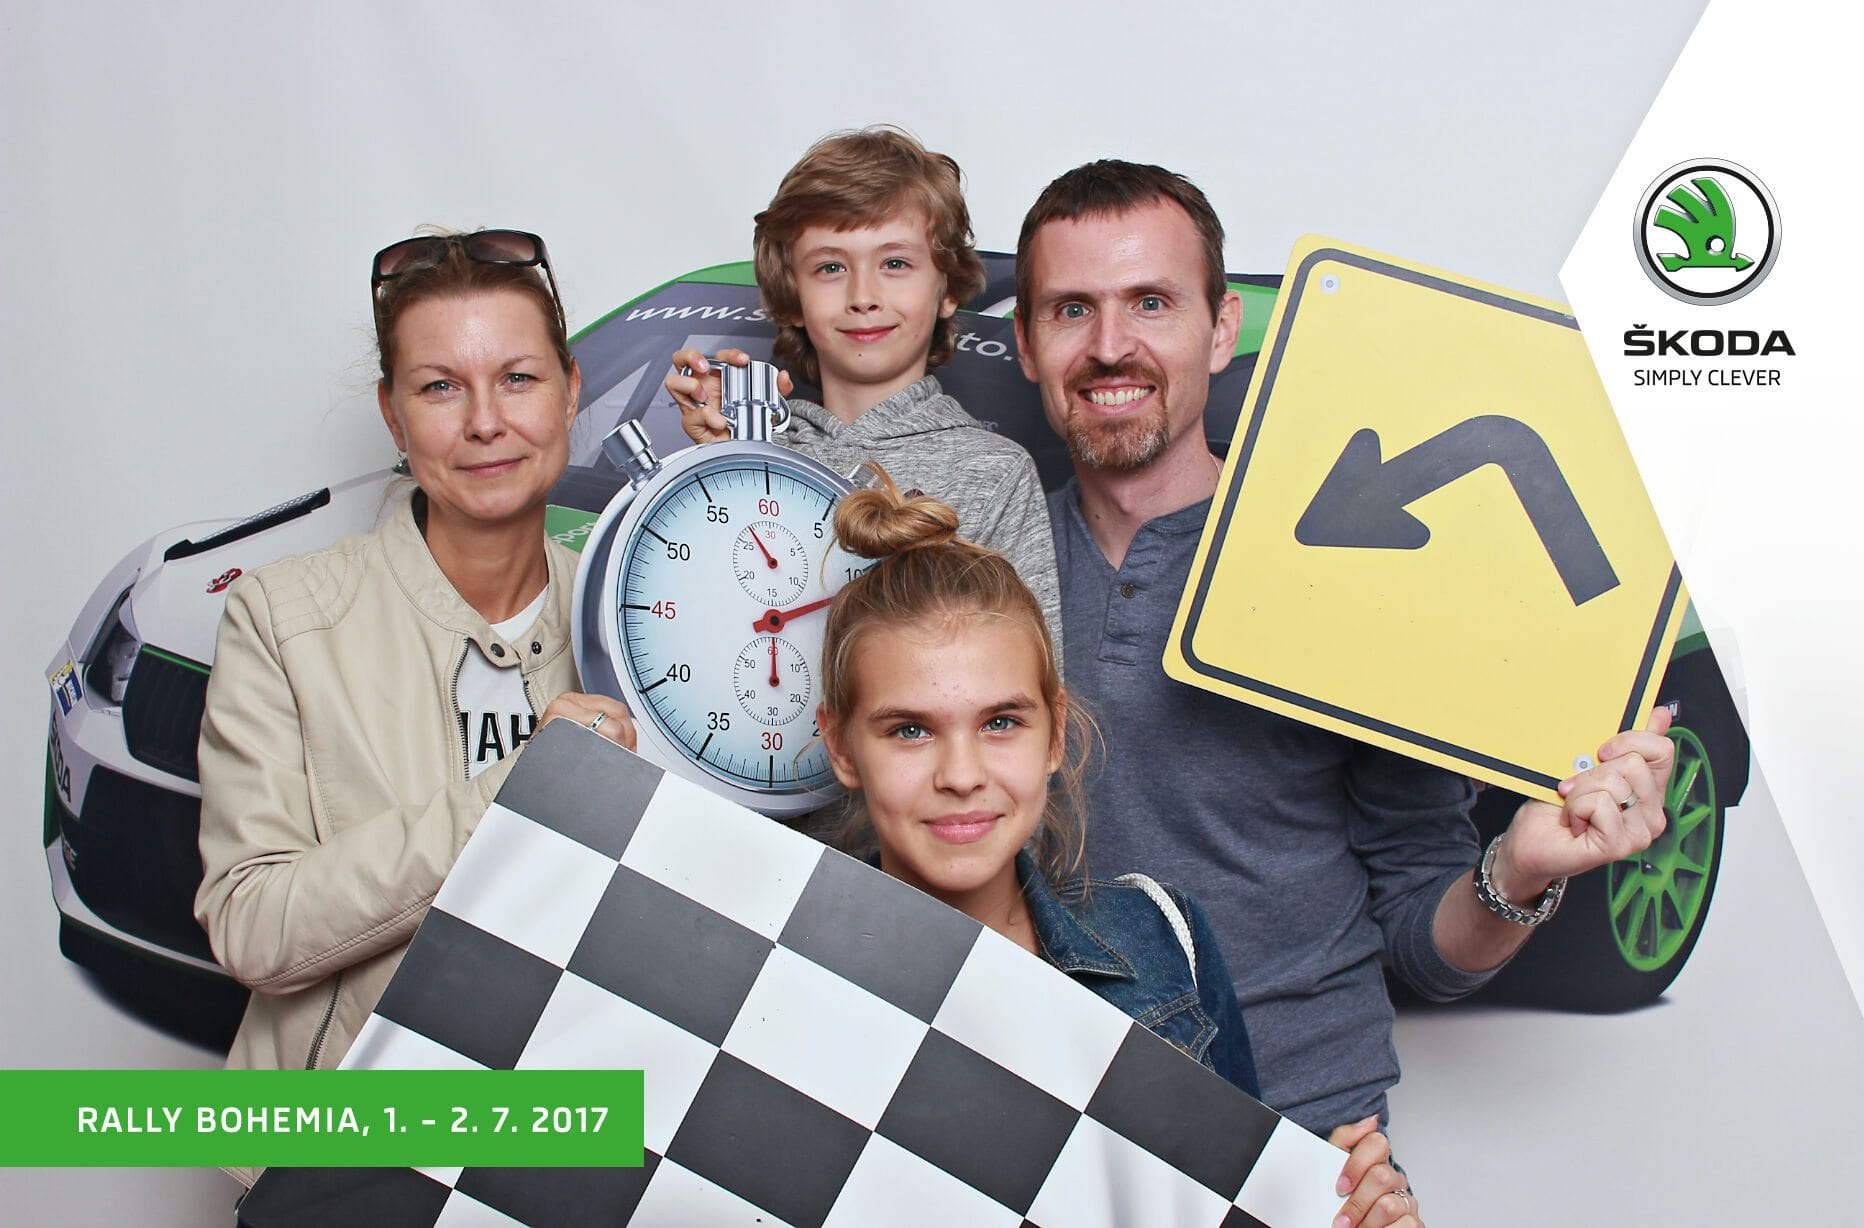 fotokoutek-skoda-rally-bohemia-1-7-2017-277906